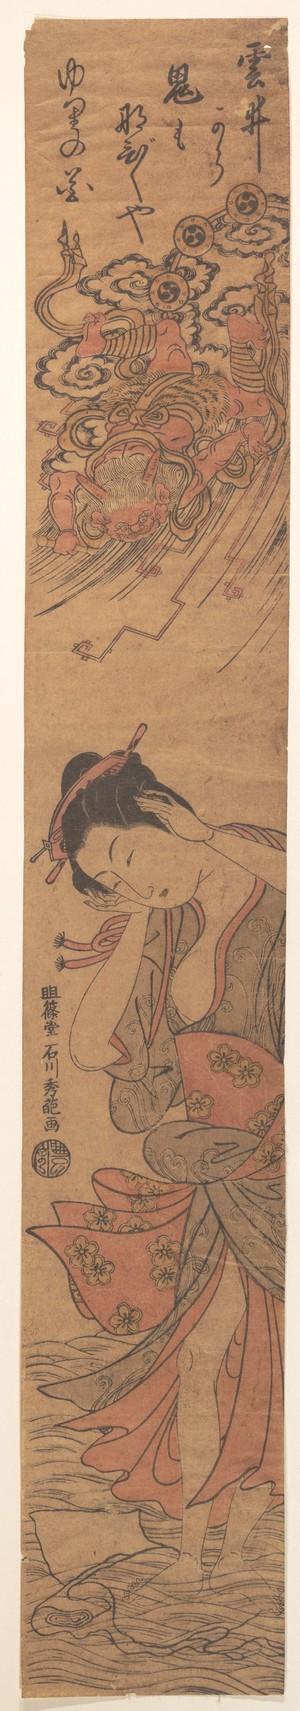 Ishikawa Toyonobu: Woman Washing Clothes - Metropolitan Museum of Art